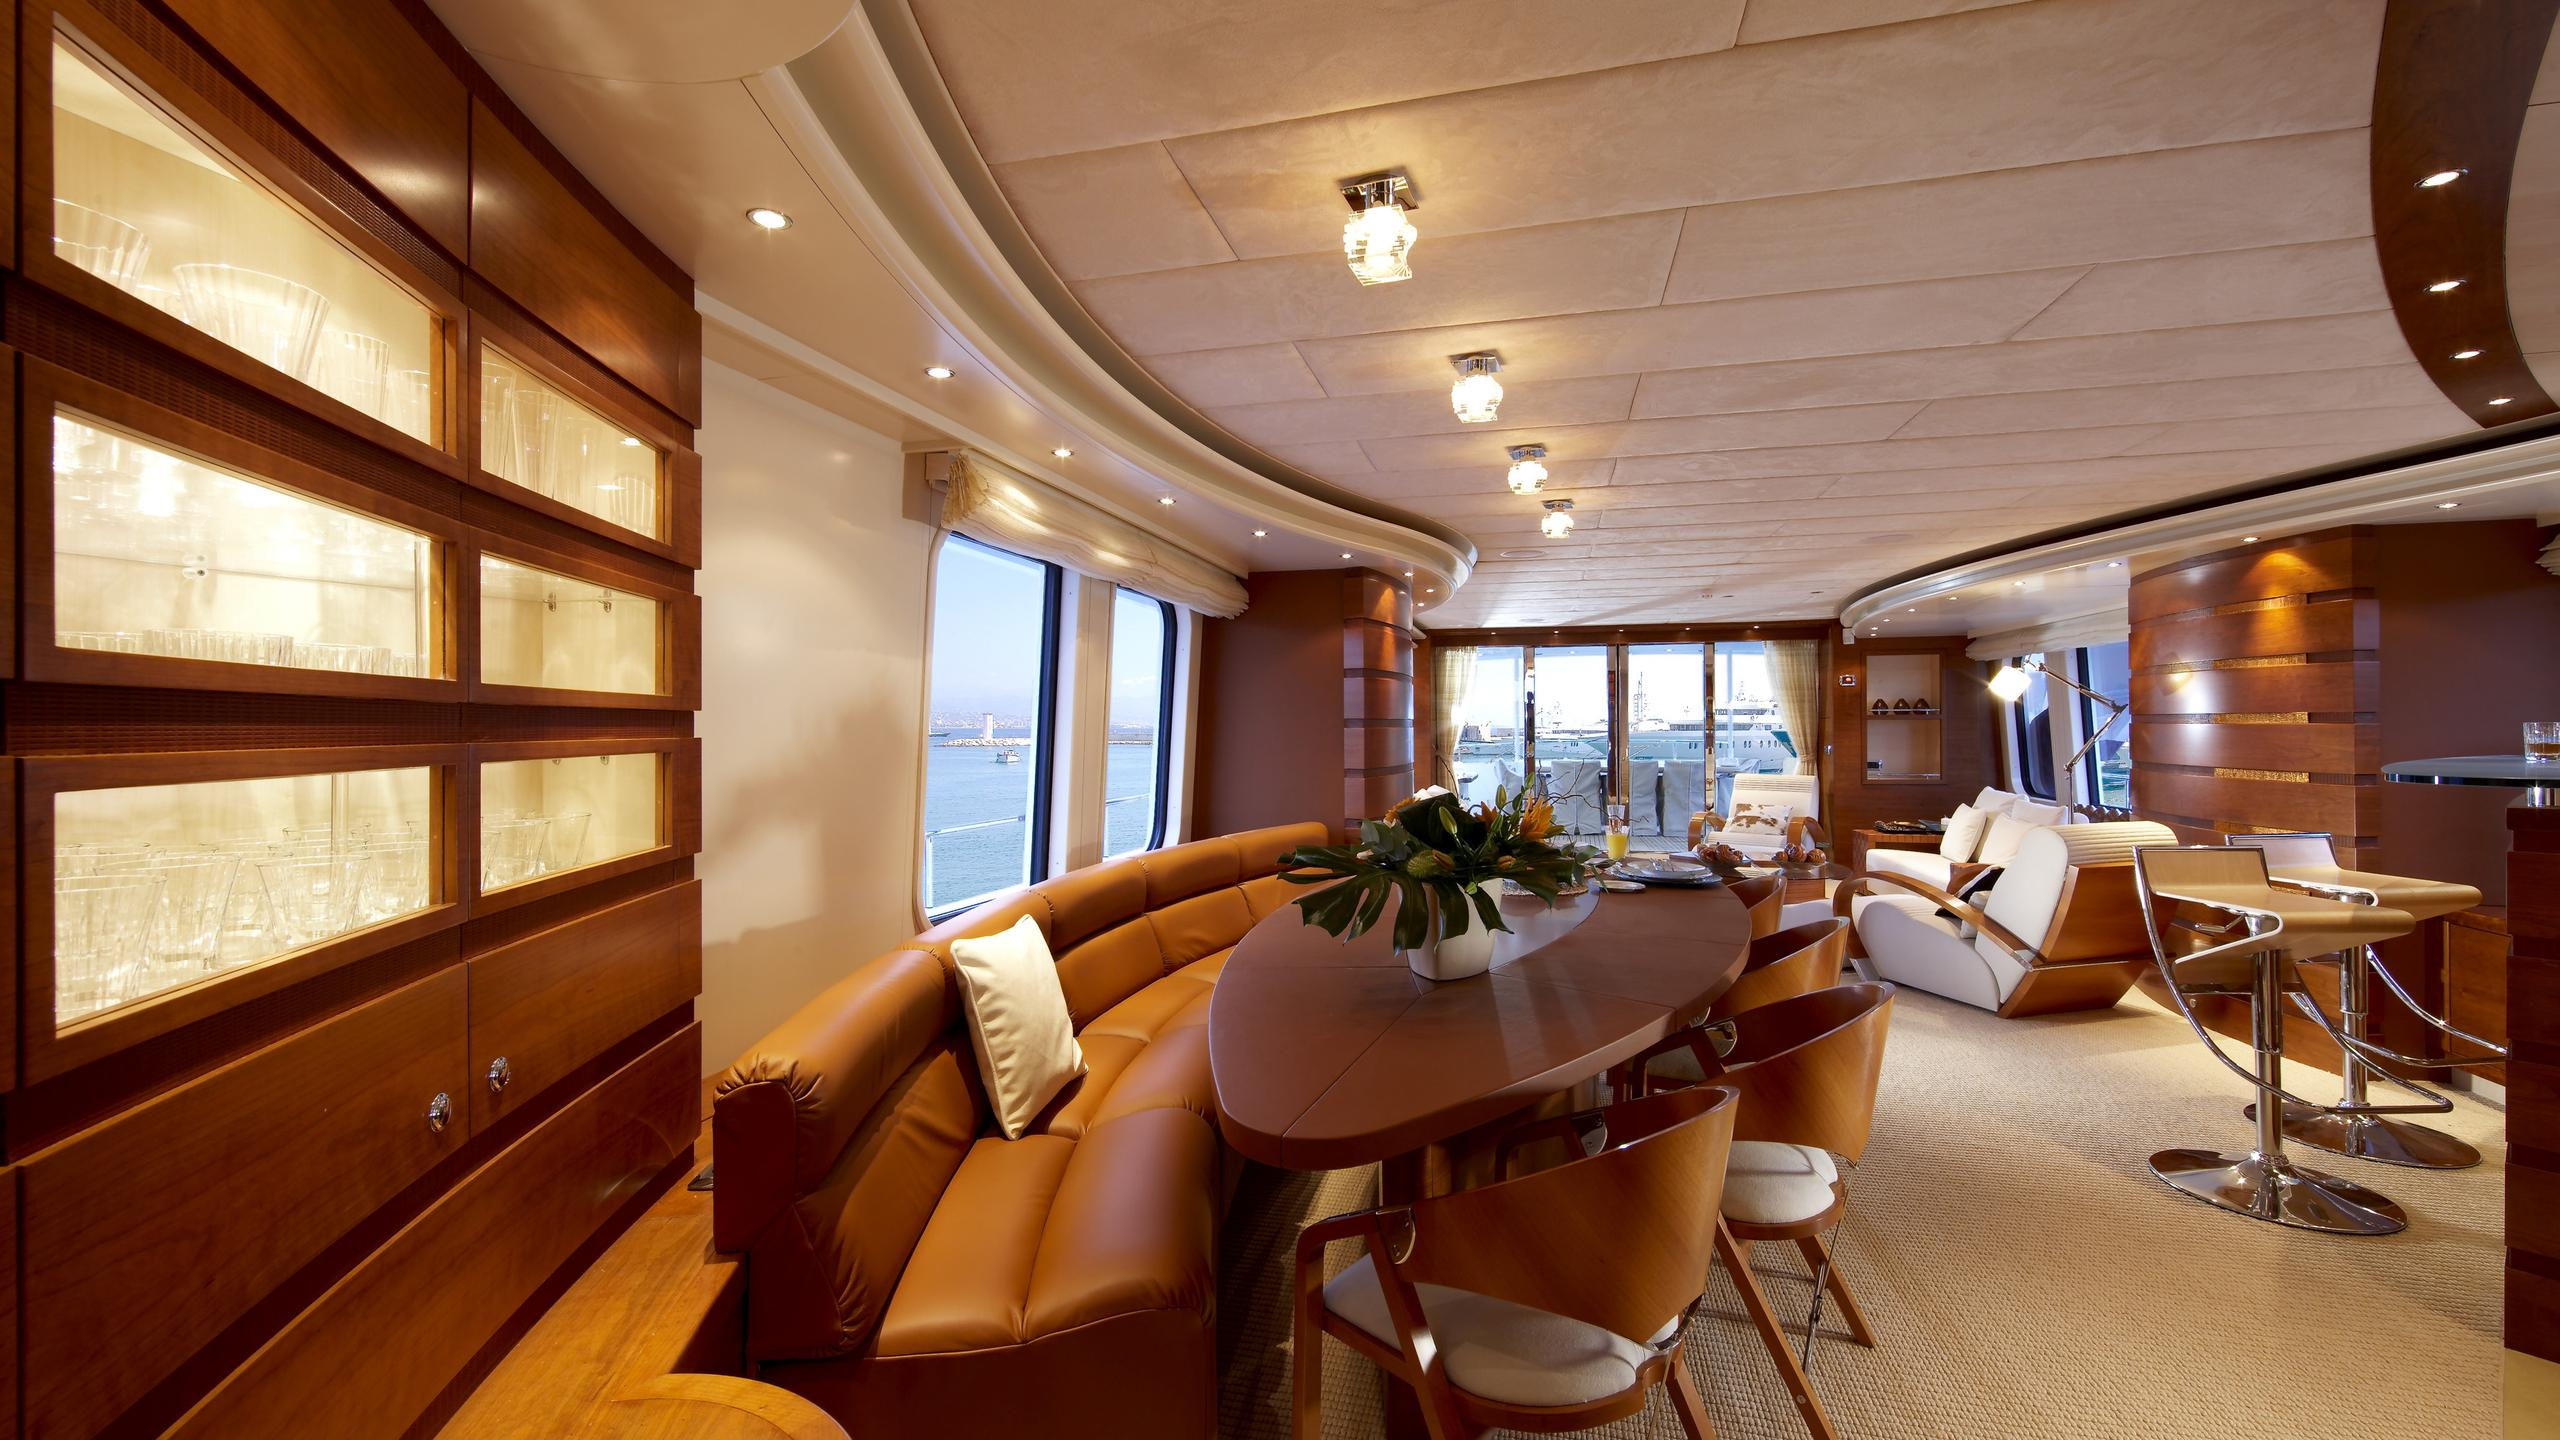 sofia-ii-yacht-dining